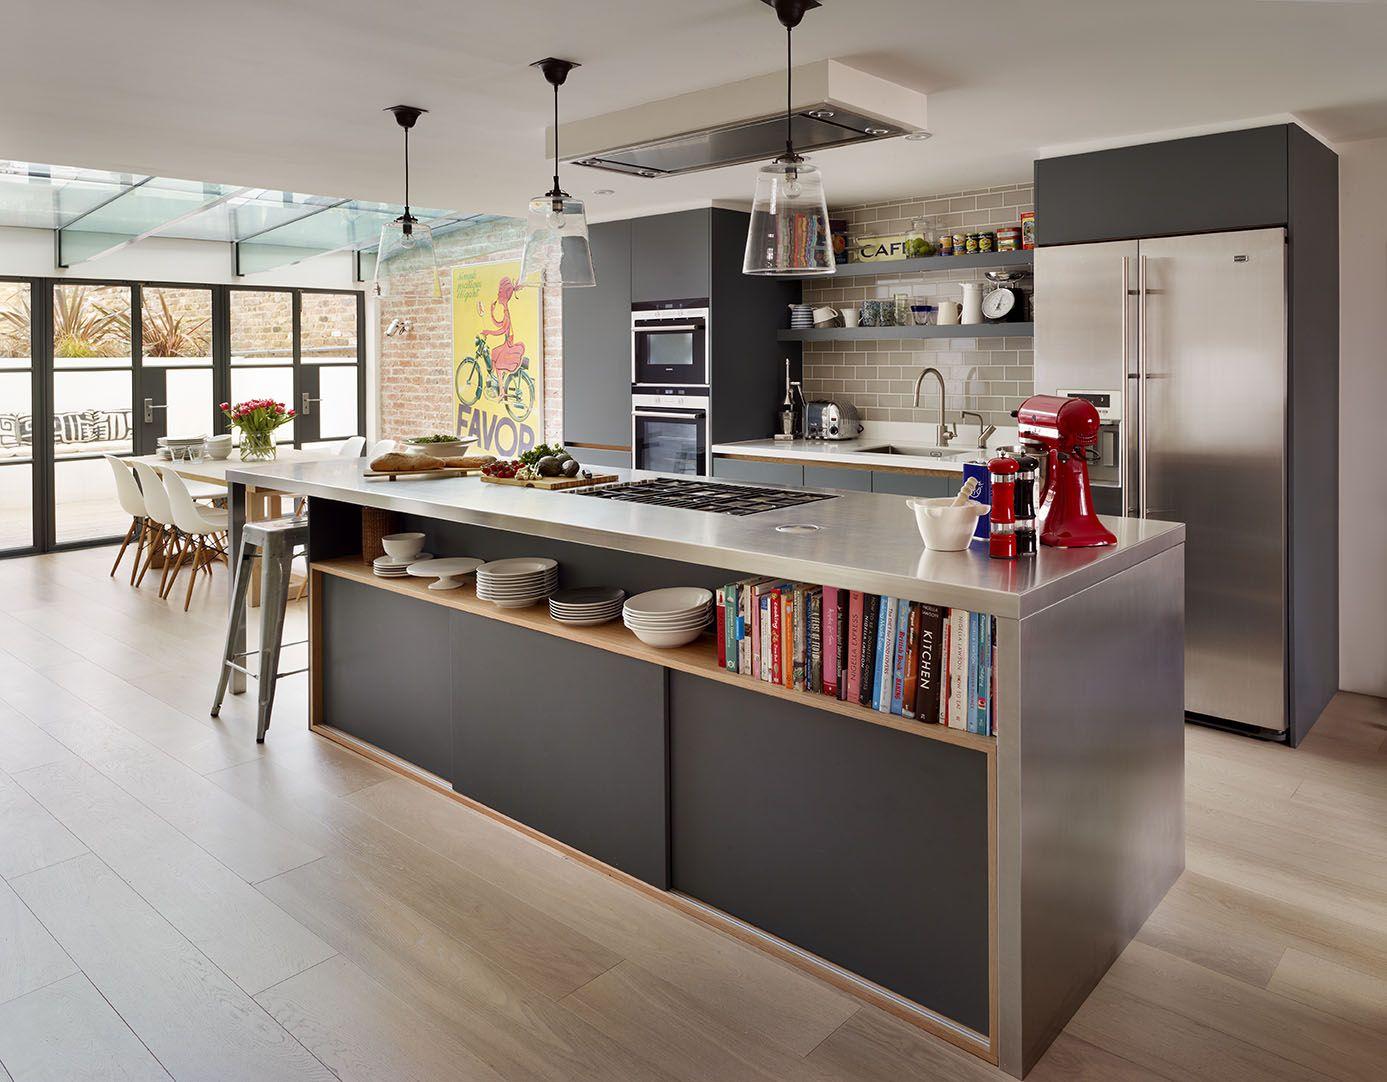 Roundhouse bespoke kitchen furniture matt lacquer Urbo kitchen in Farrow & Ball Downpipe